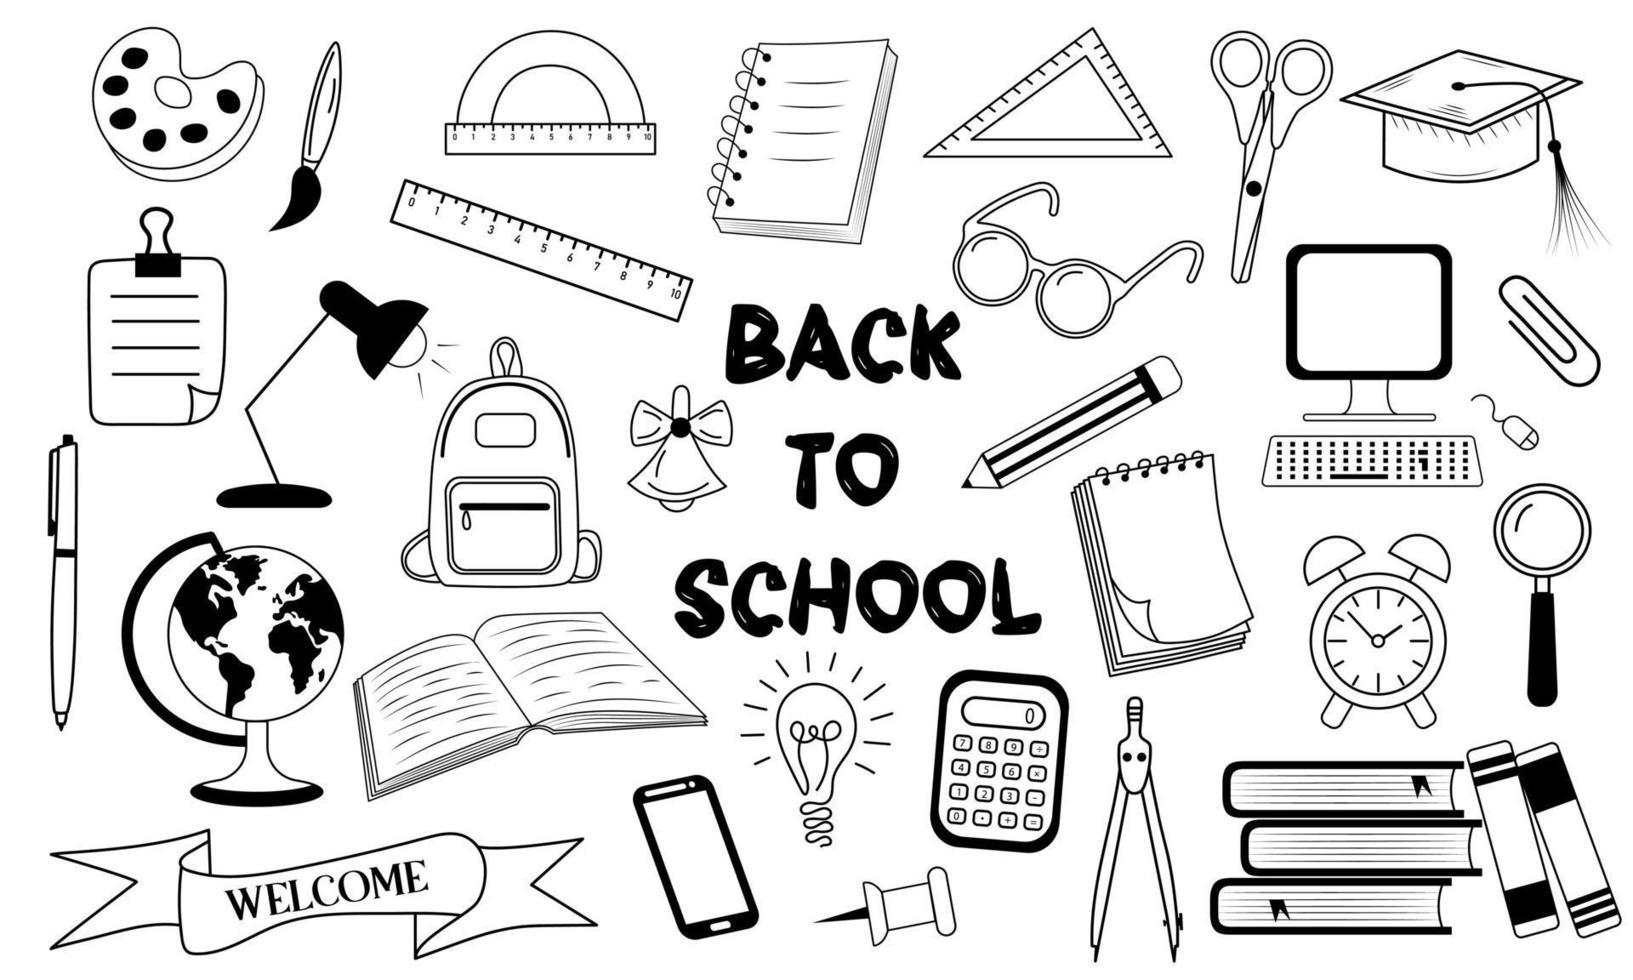 de volta ao conjunto de ícones do doodle da escola. vetor